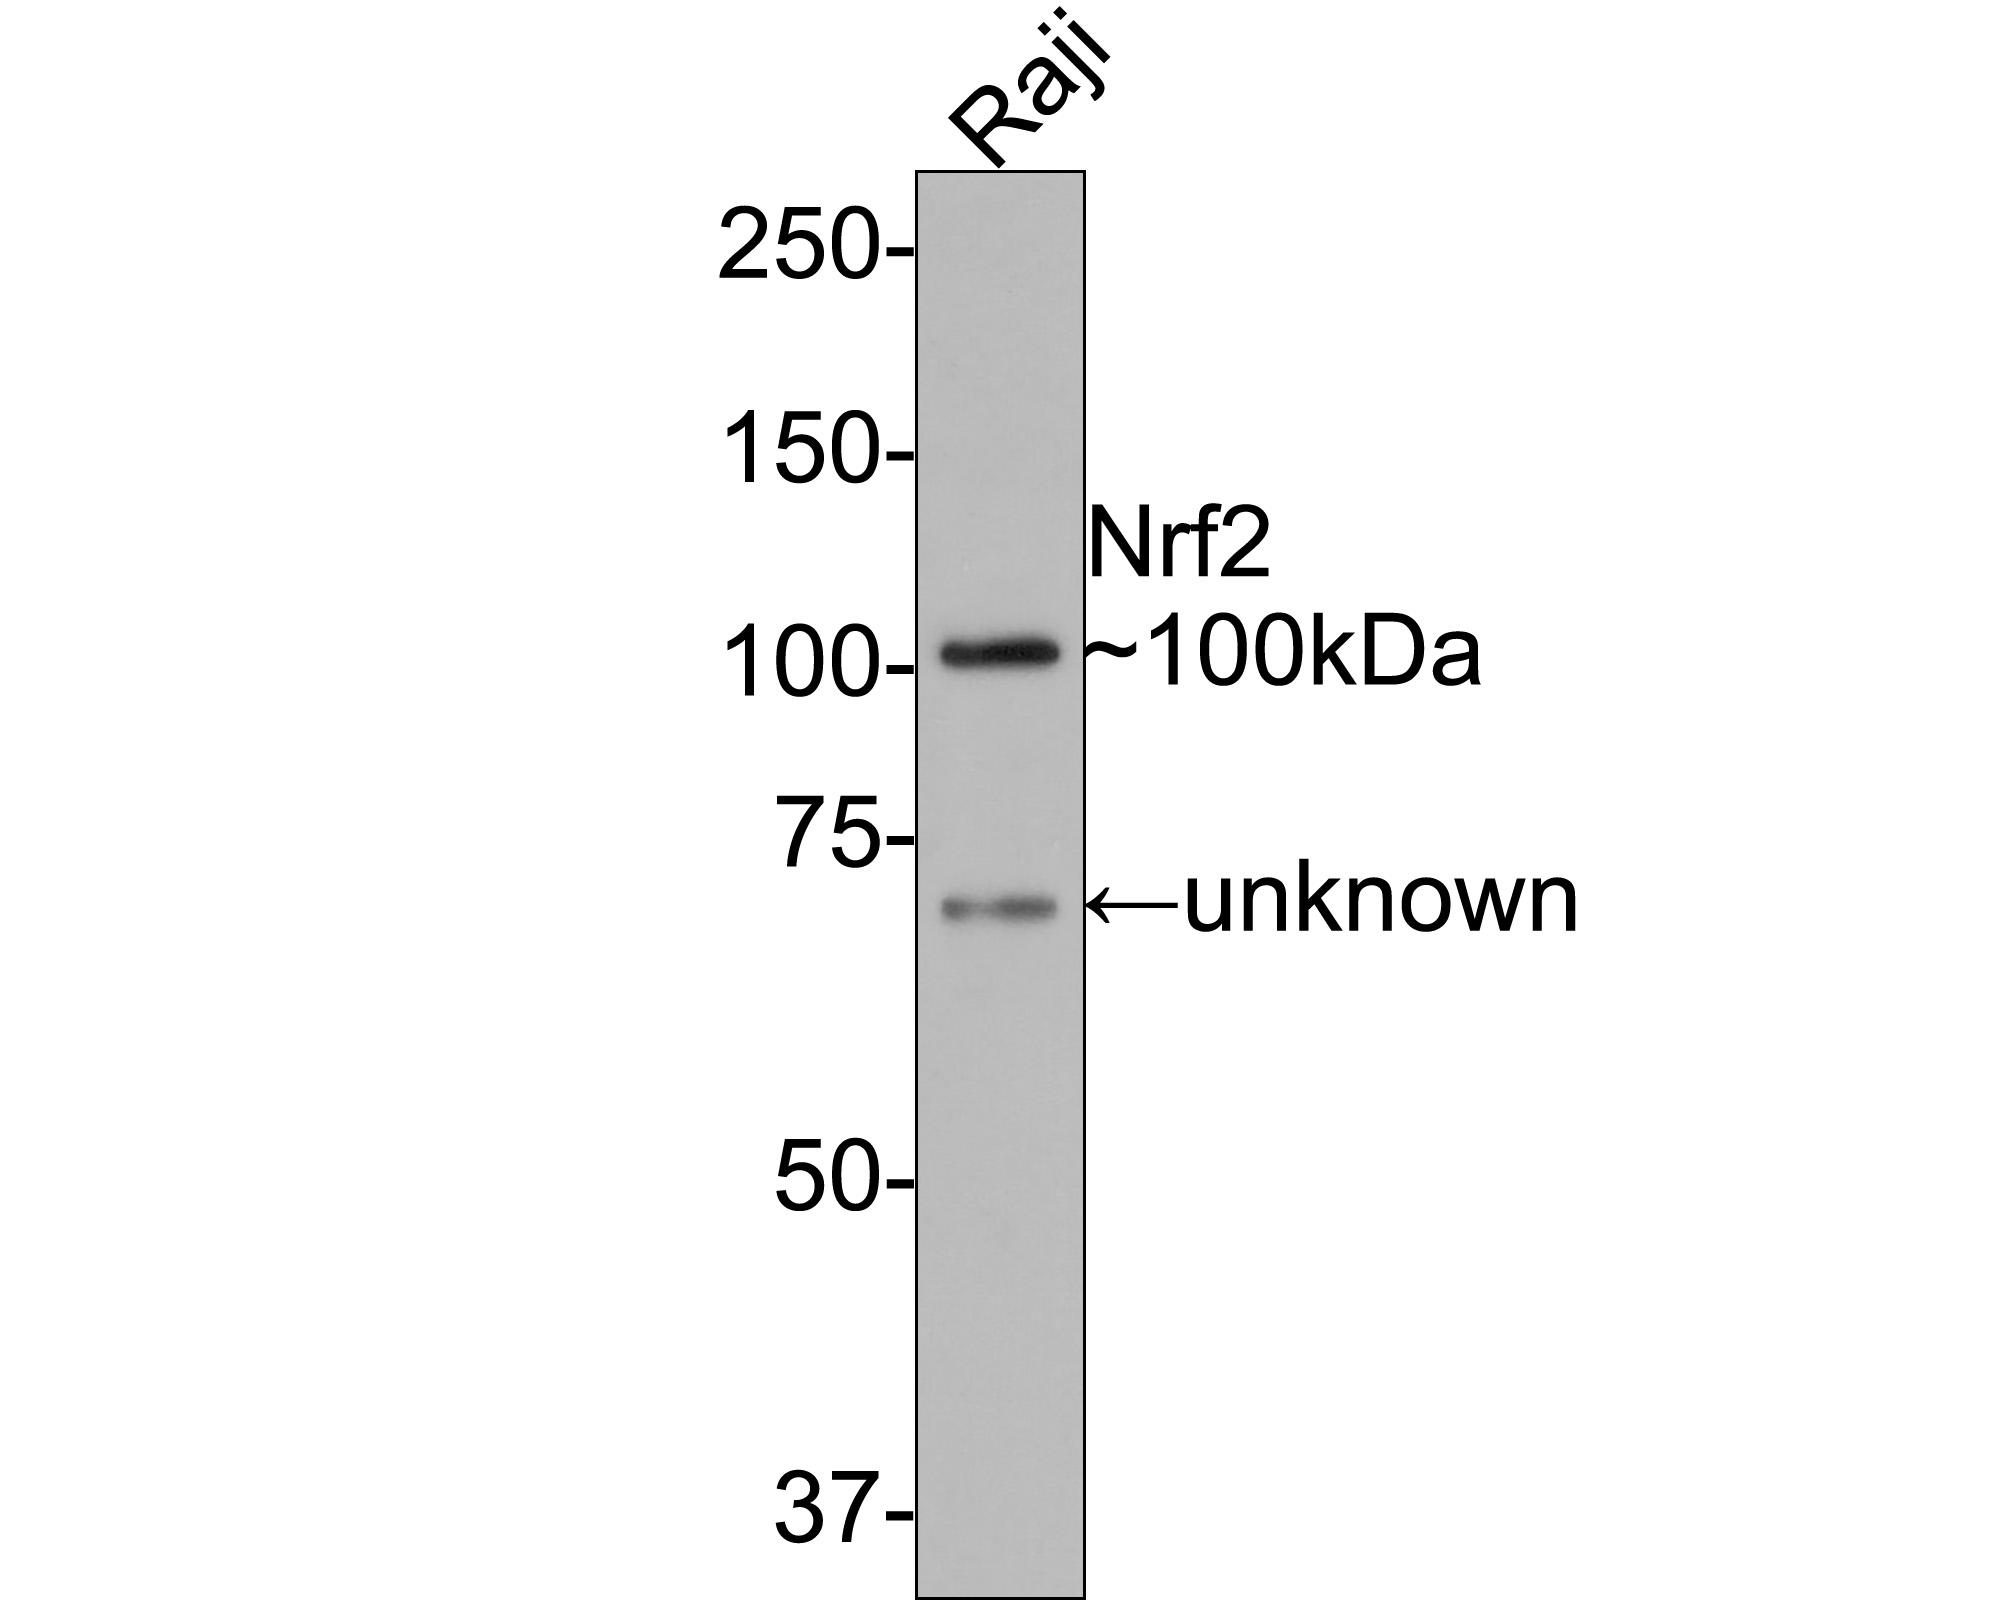 Western blot analysis on different lysates using anti-Nrf2 rabbit polyclonal antibodies.